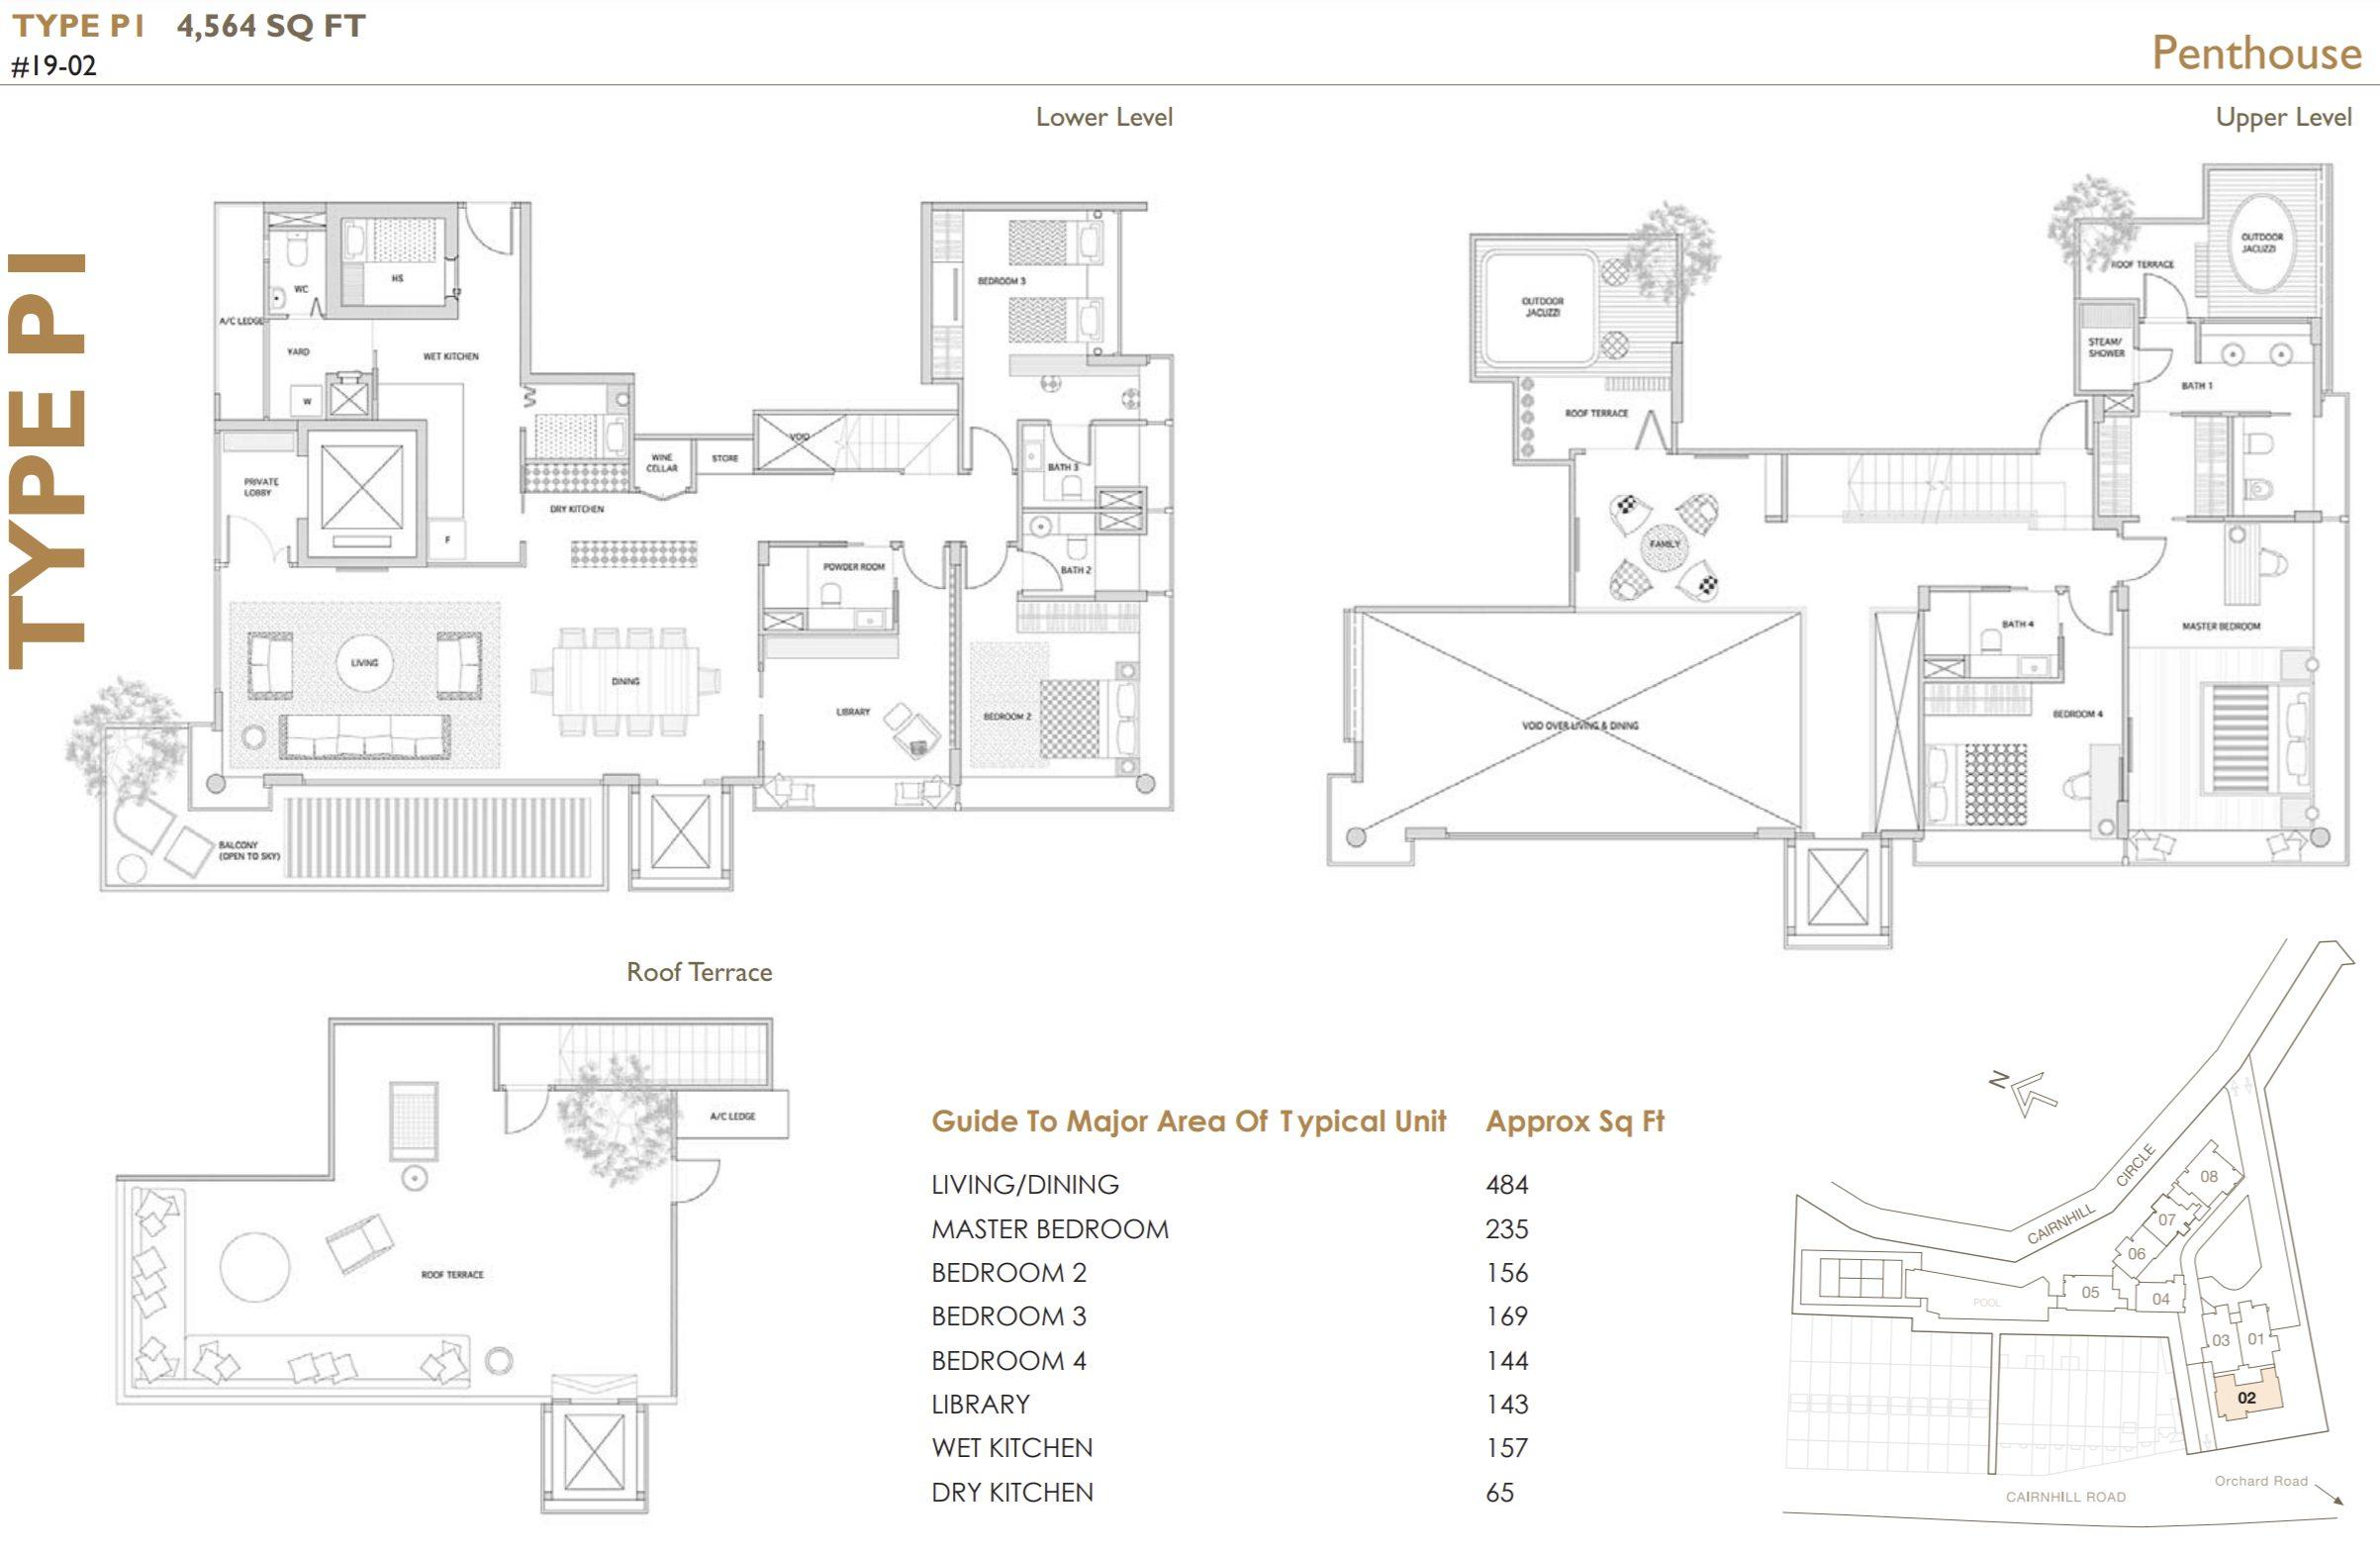 helios residences penthouse fire sale floor plan